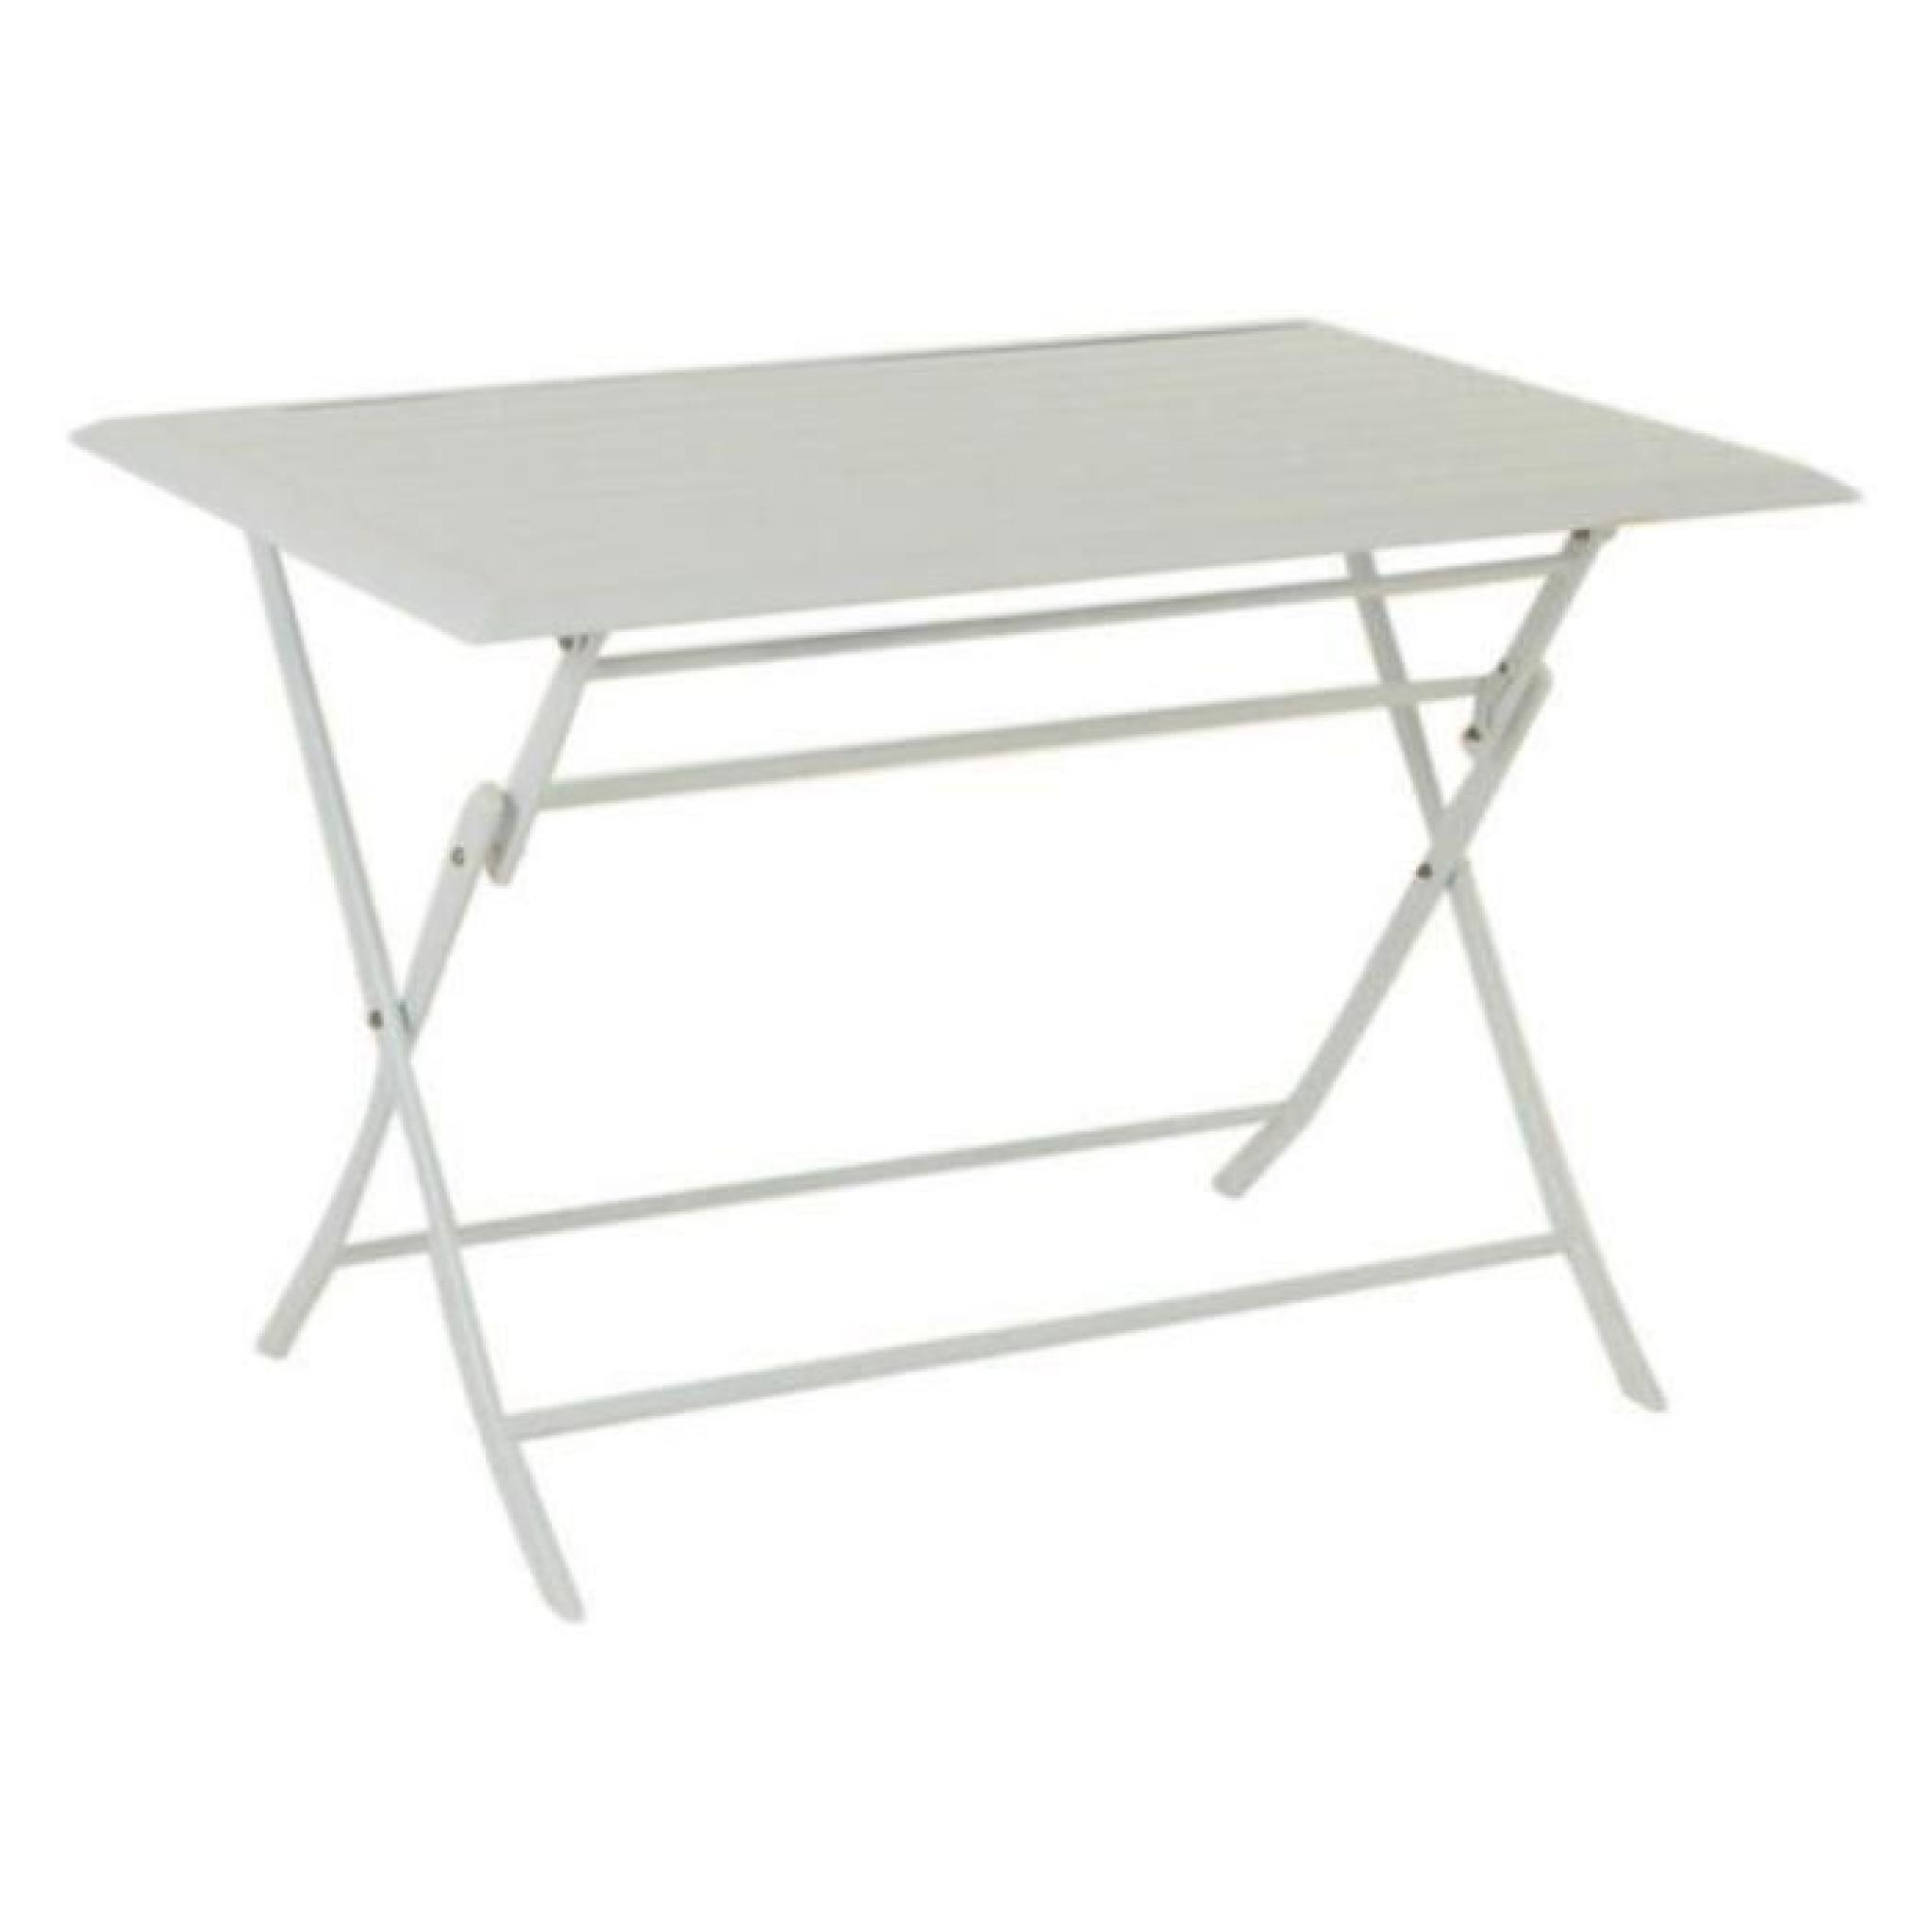 TABLE AZUA HESPERIDE PLIANTE ALU BLANC 4 PLACES - Achat/Vente table ...